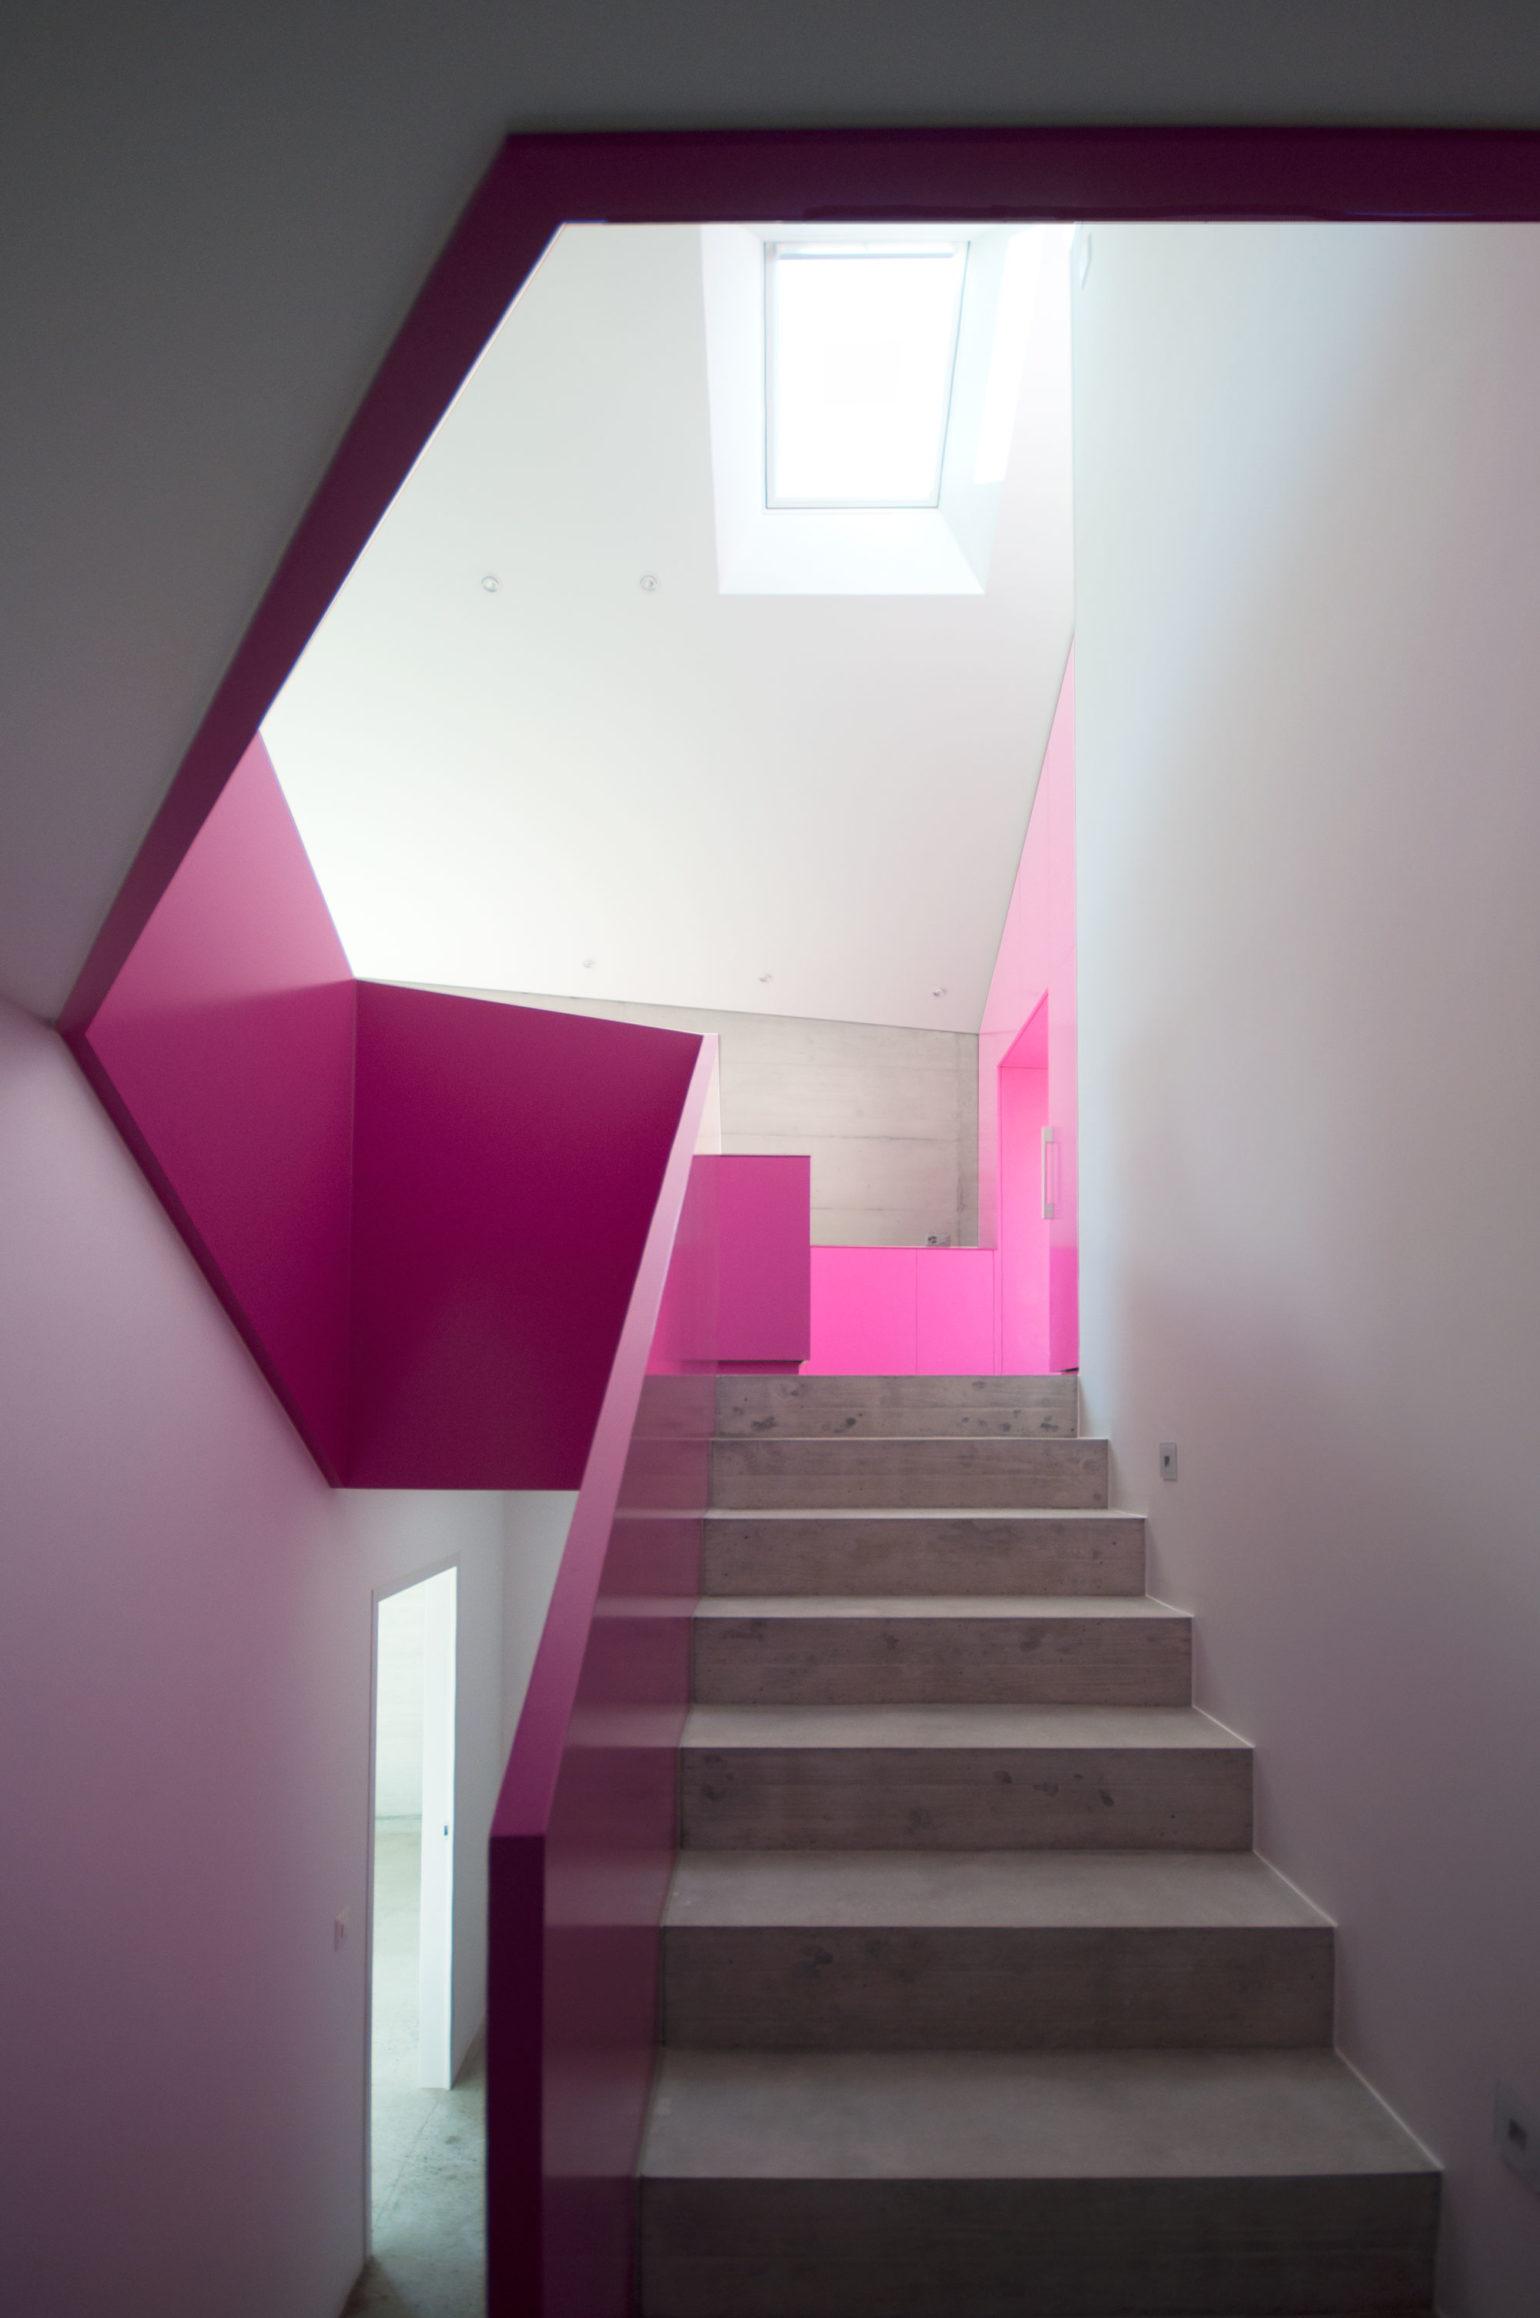 maison_dubosson_troistorrents_meyer_architecture_sion_09